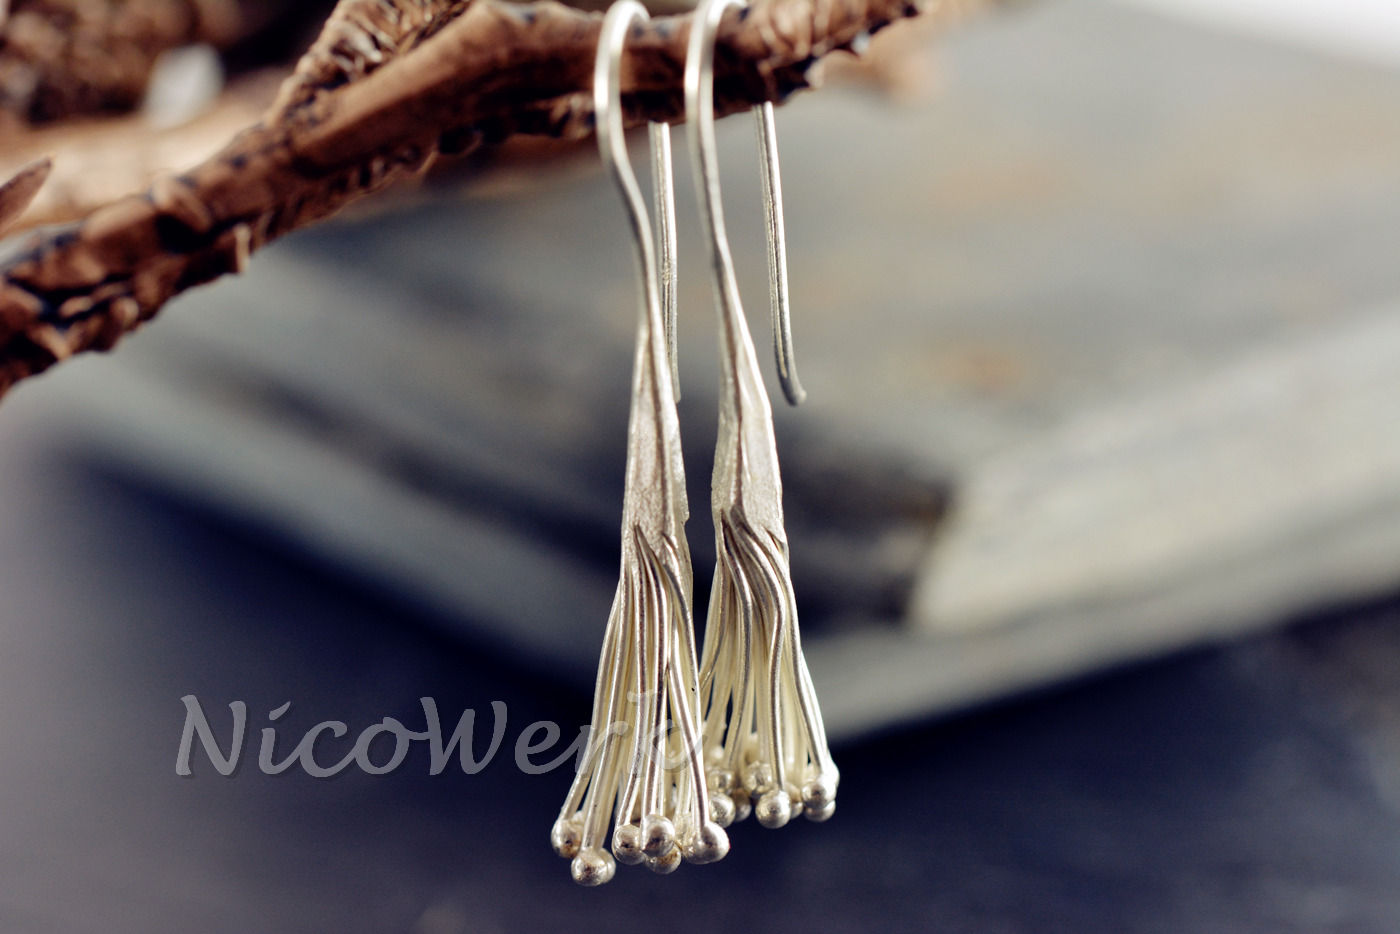 Silberschmuck kaufen online  NicoWerk Silberschmuck | Silber Ohrringe - Kollektion